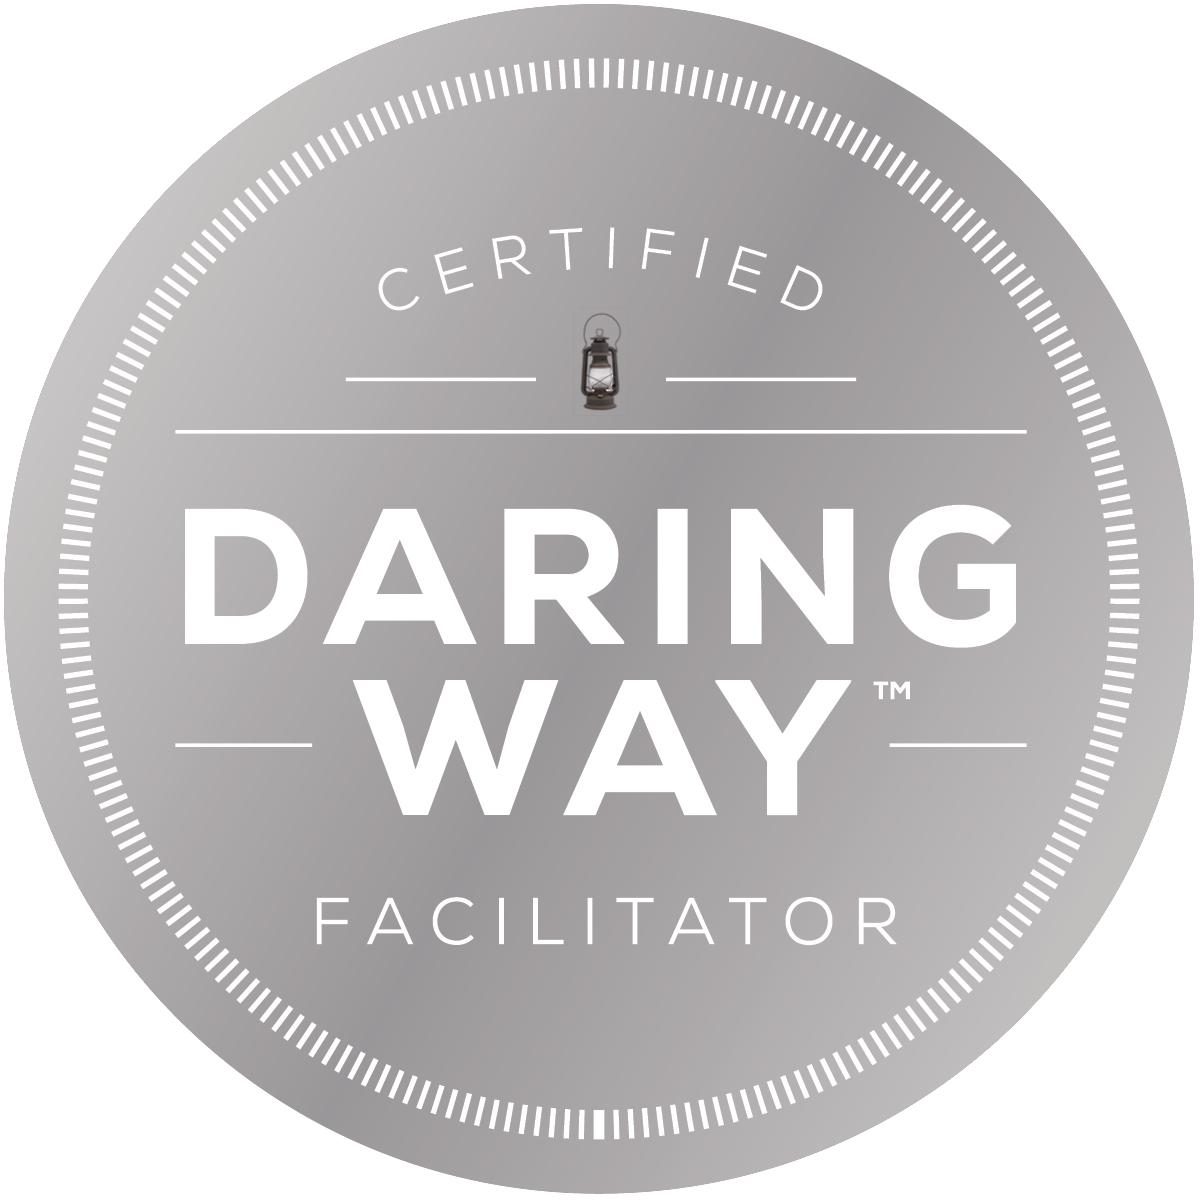 Daring Way Facilitator Seal